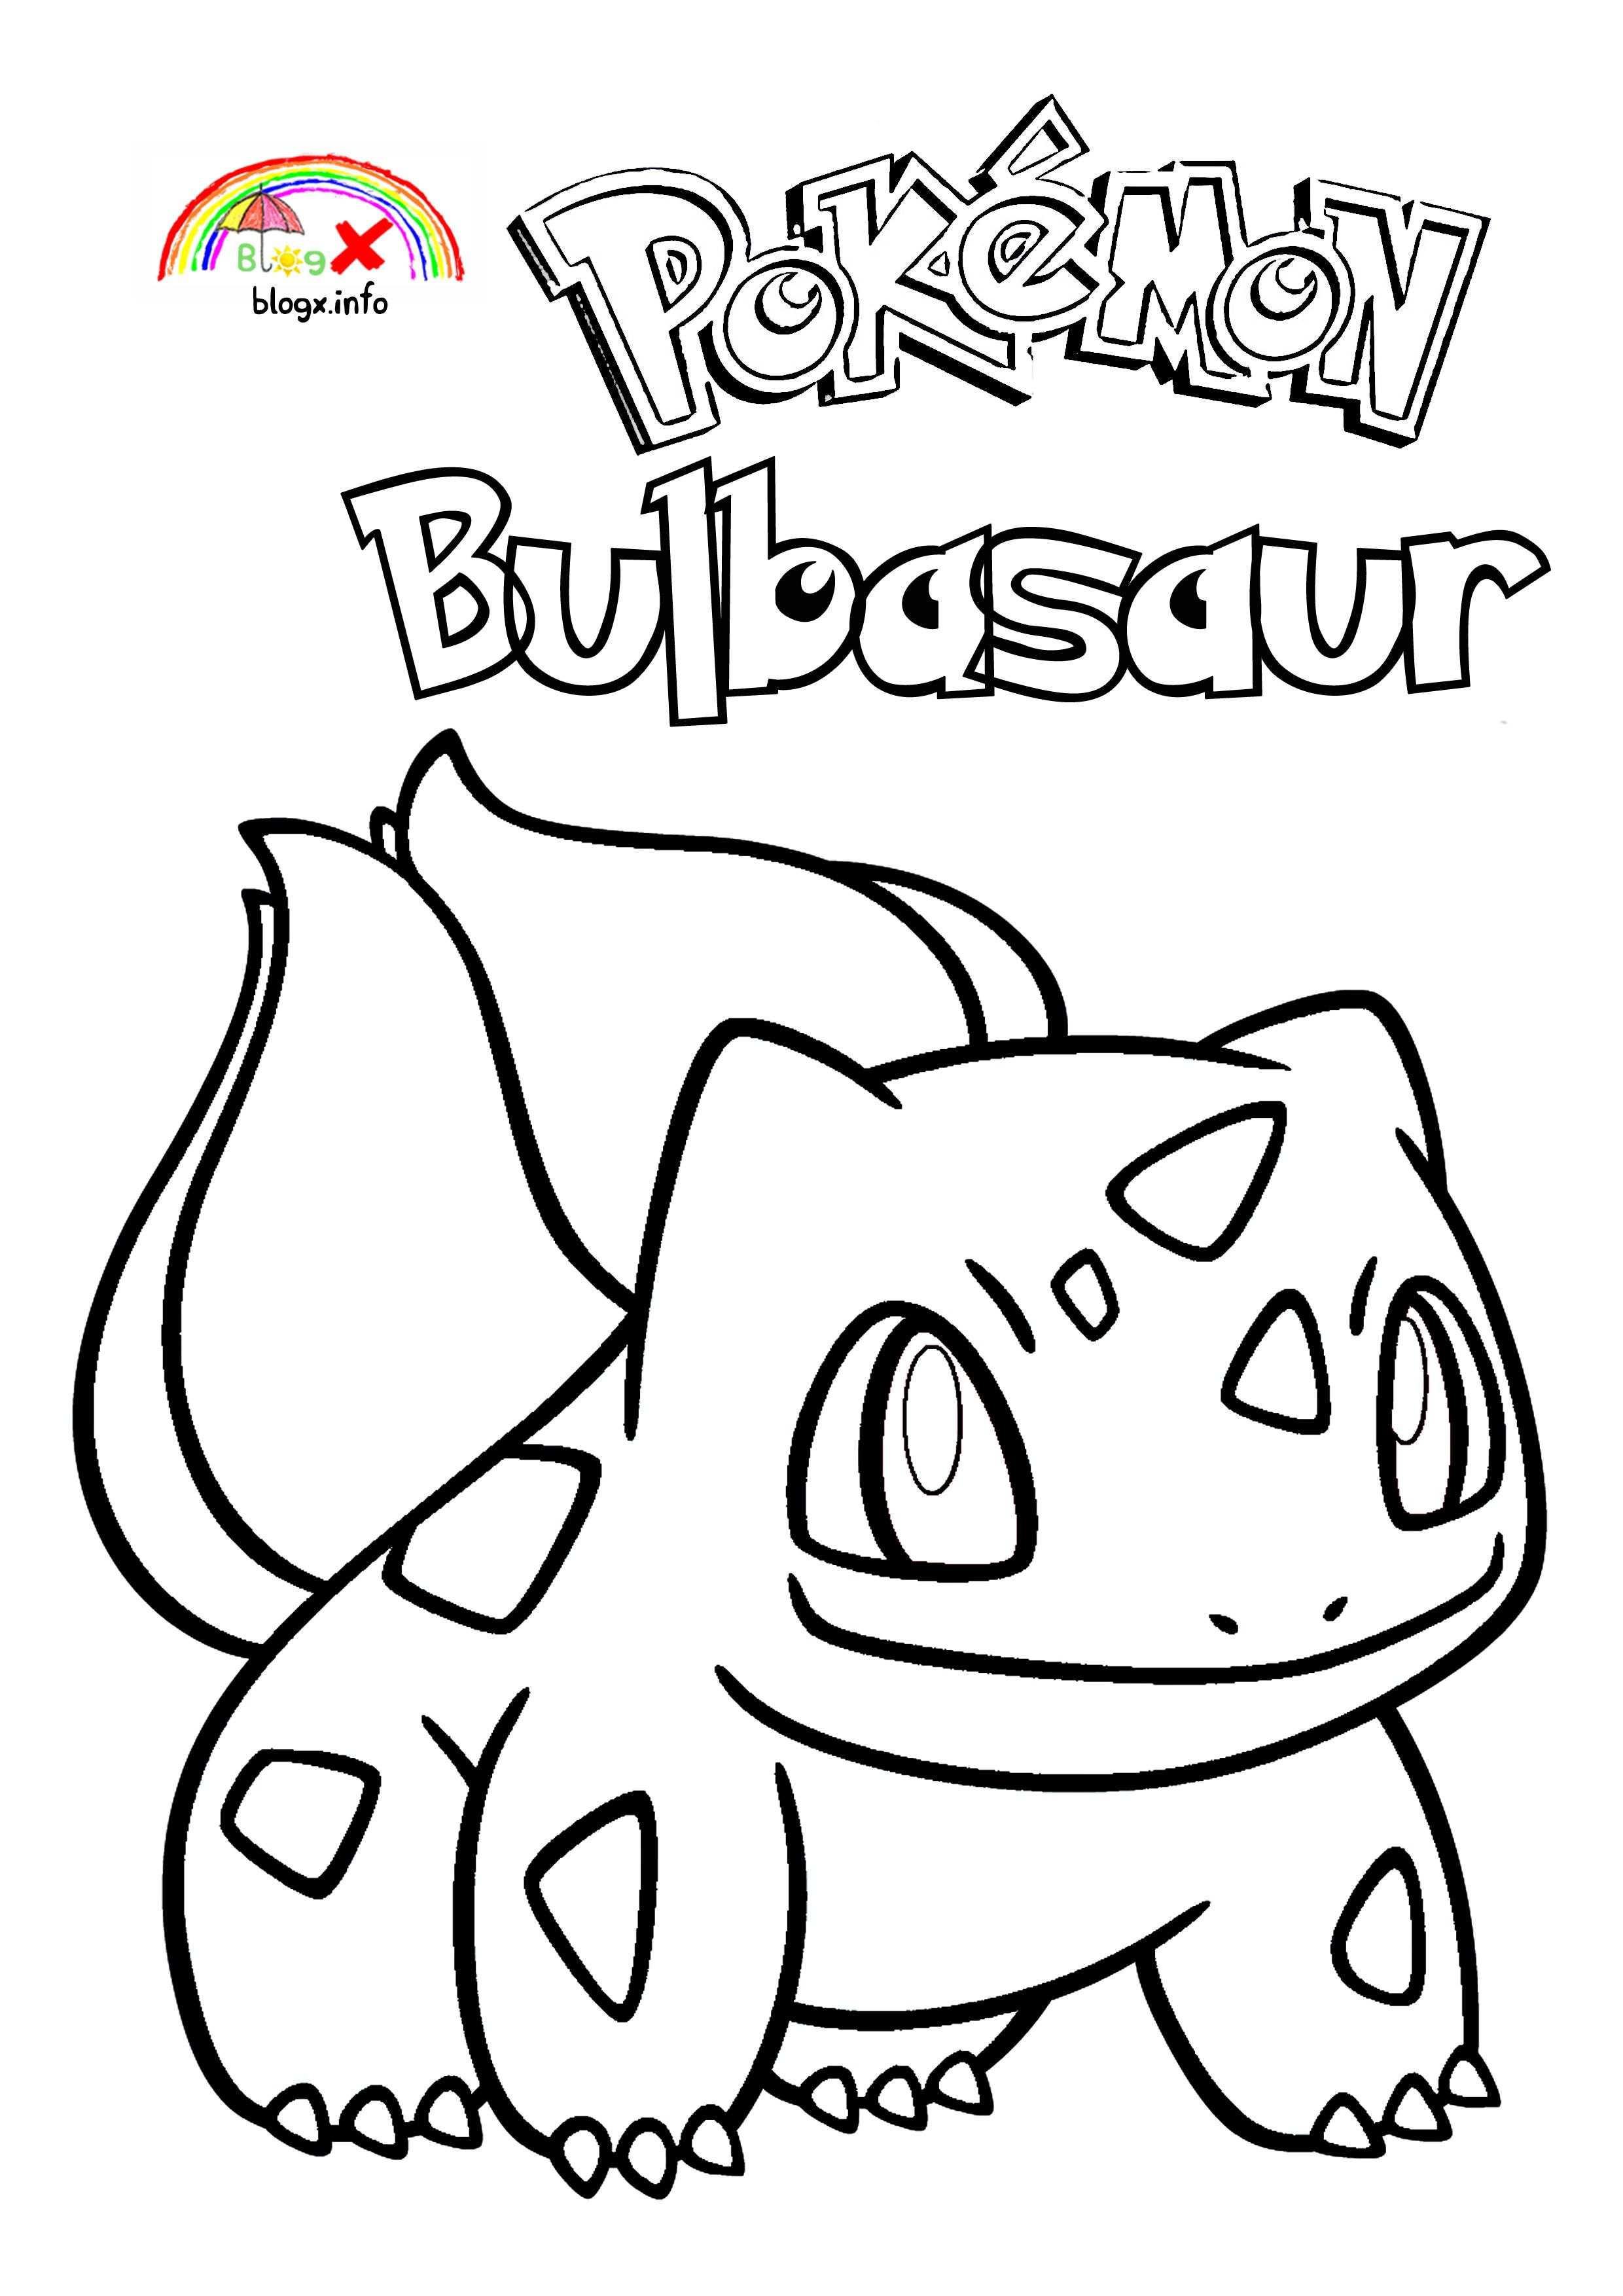 Pokemon Bulbasaur Coloring Page Blogx Info